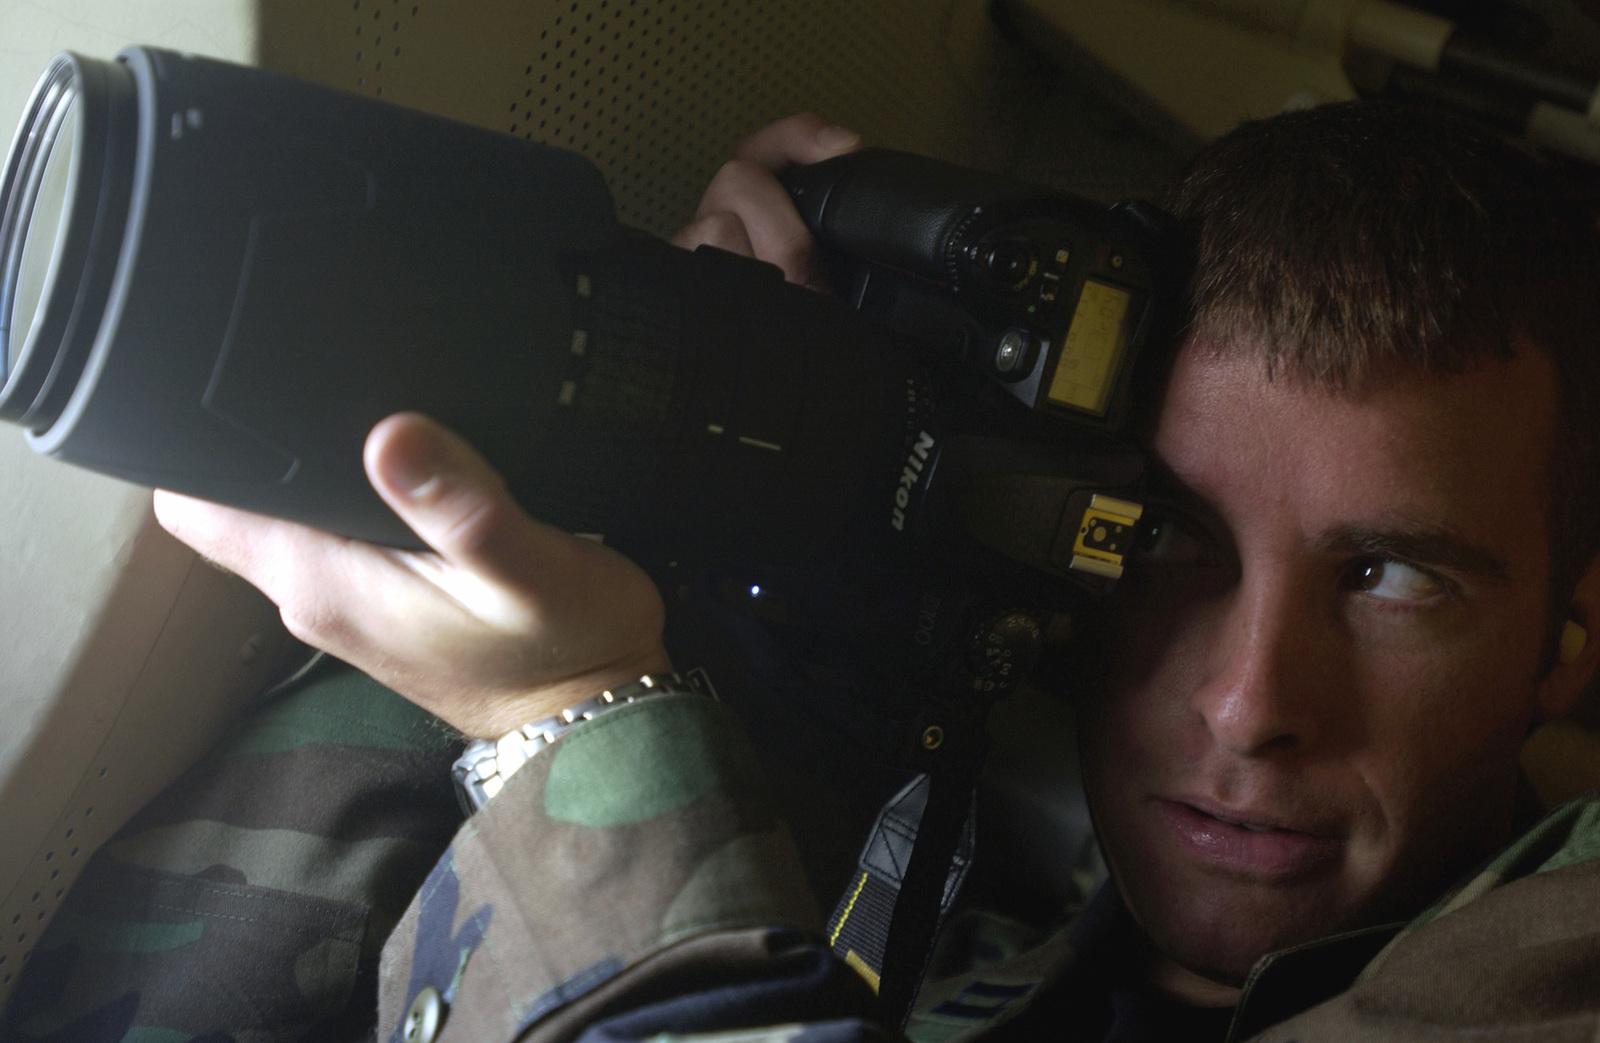 US Air Force (USAF) Captain (CPT) Alan Amato, PHOTO Flight